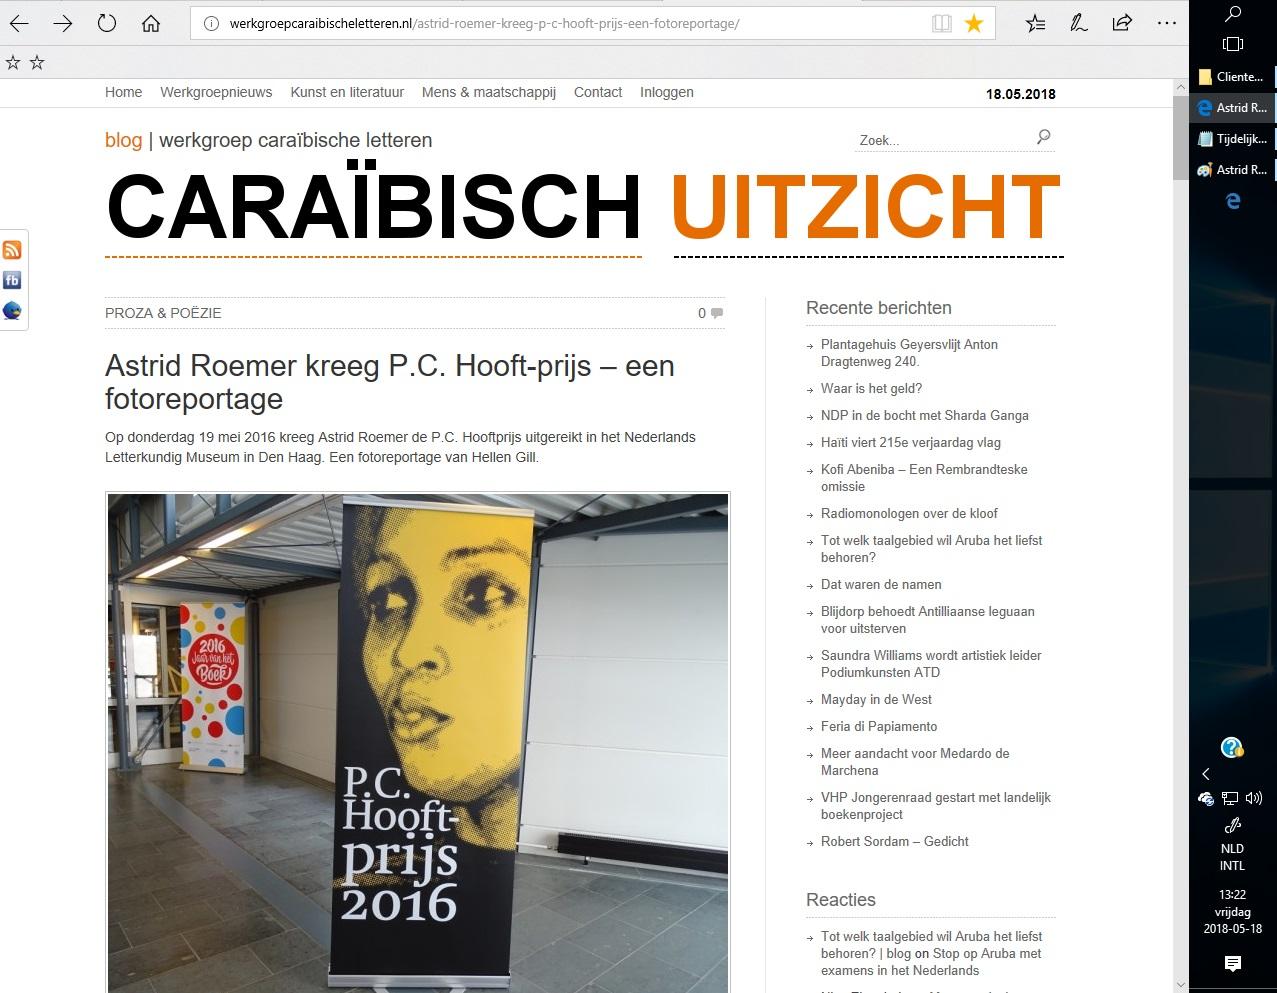 Astrid Roemer 2016 PCHooftPrijs2